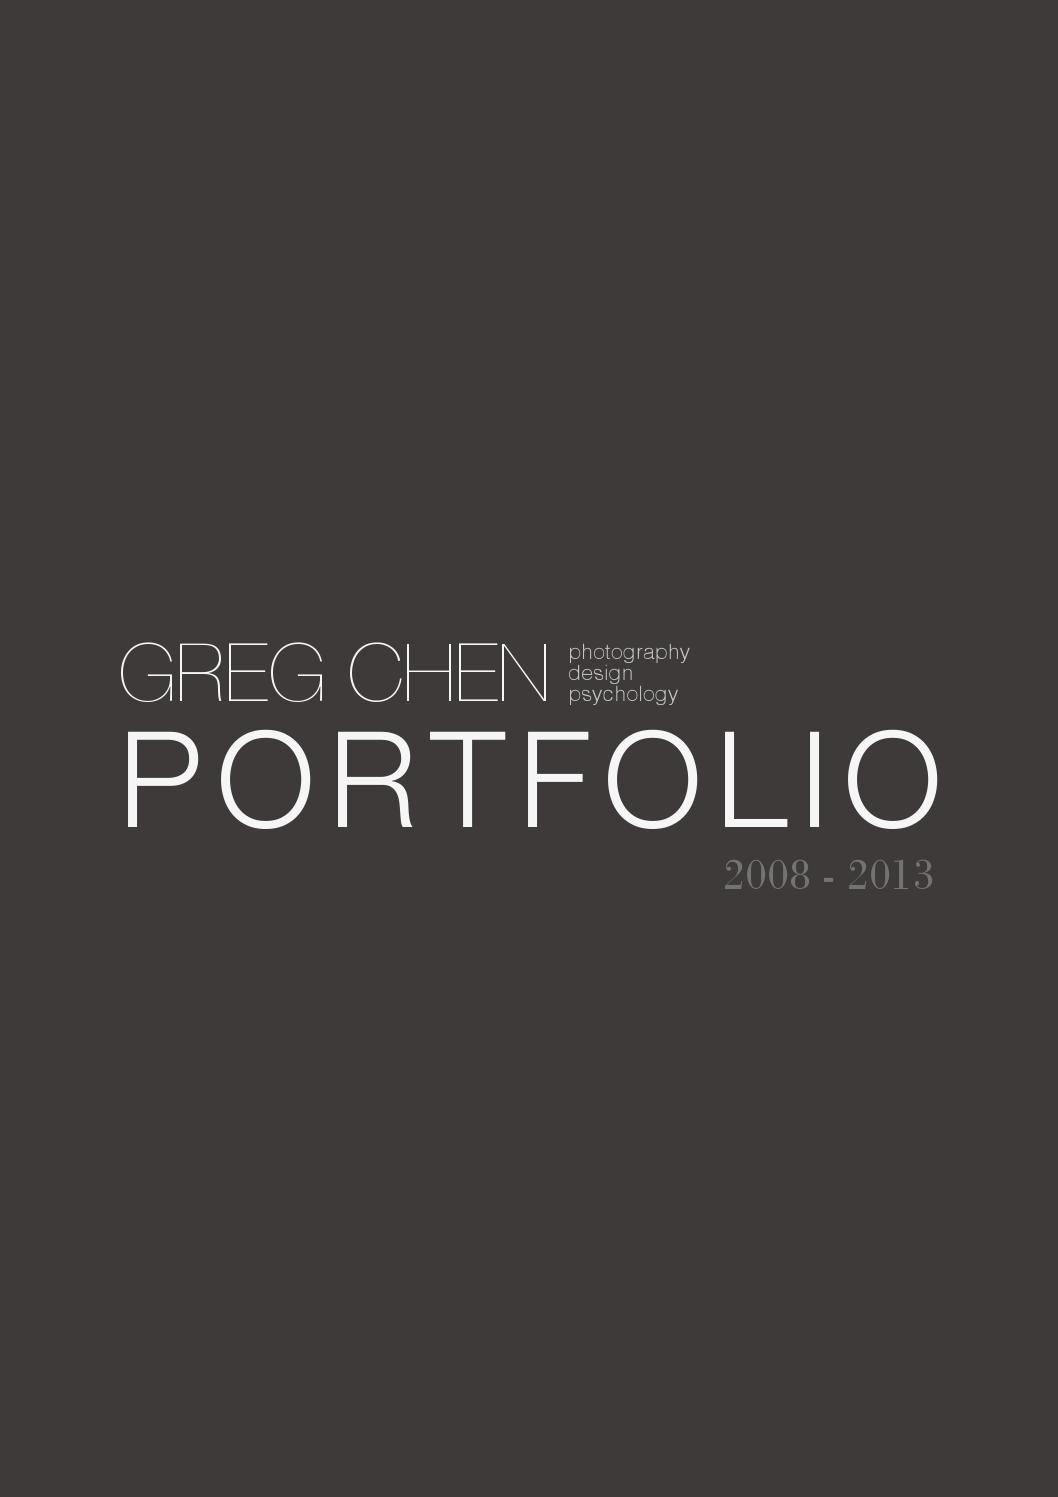 Portfolio Cover Pages Templates Lovely Greg Chen Design Portfolio 2013 by Greg Chen issuu